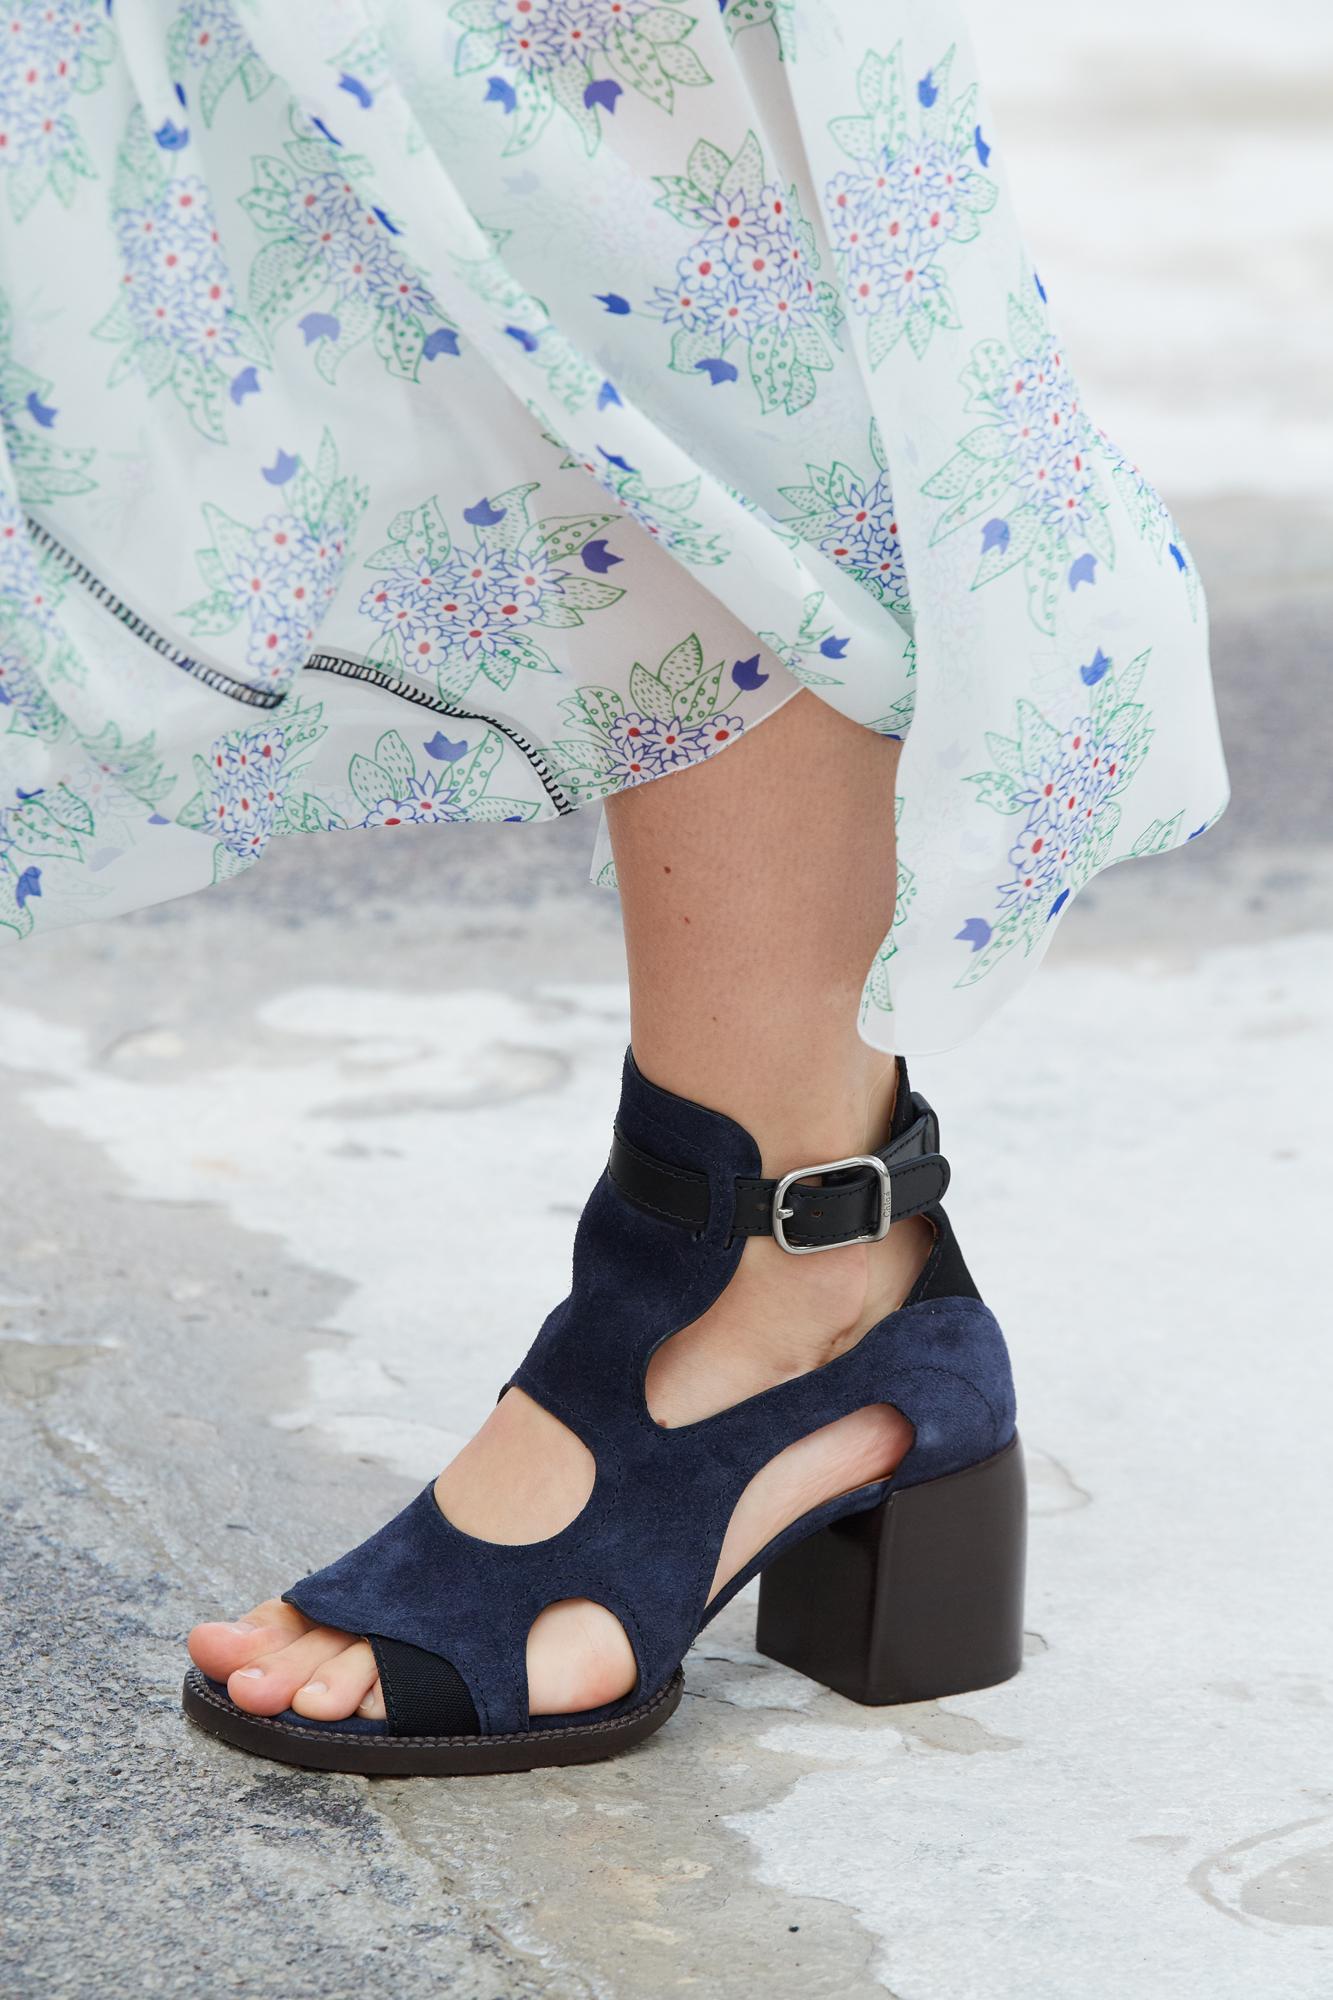 Chloe Spring 2021 Fashion Show Details Photos